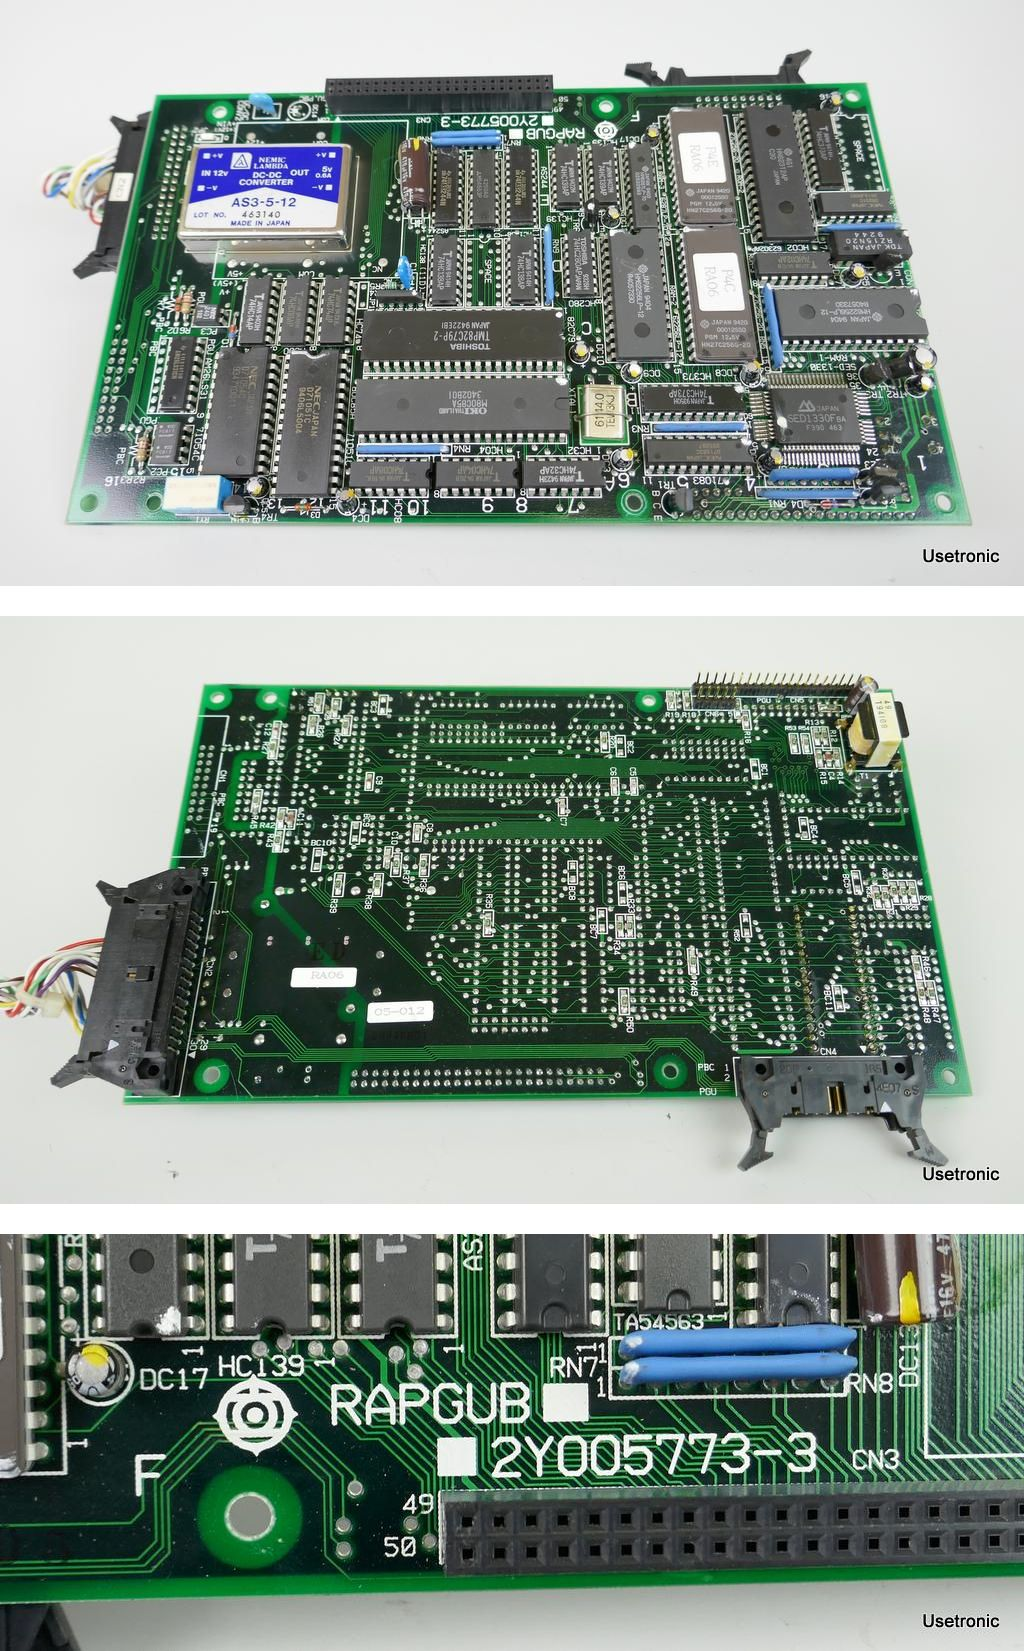 Hitachi RAPGUB 2Y005773-2